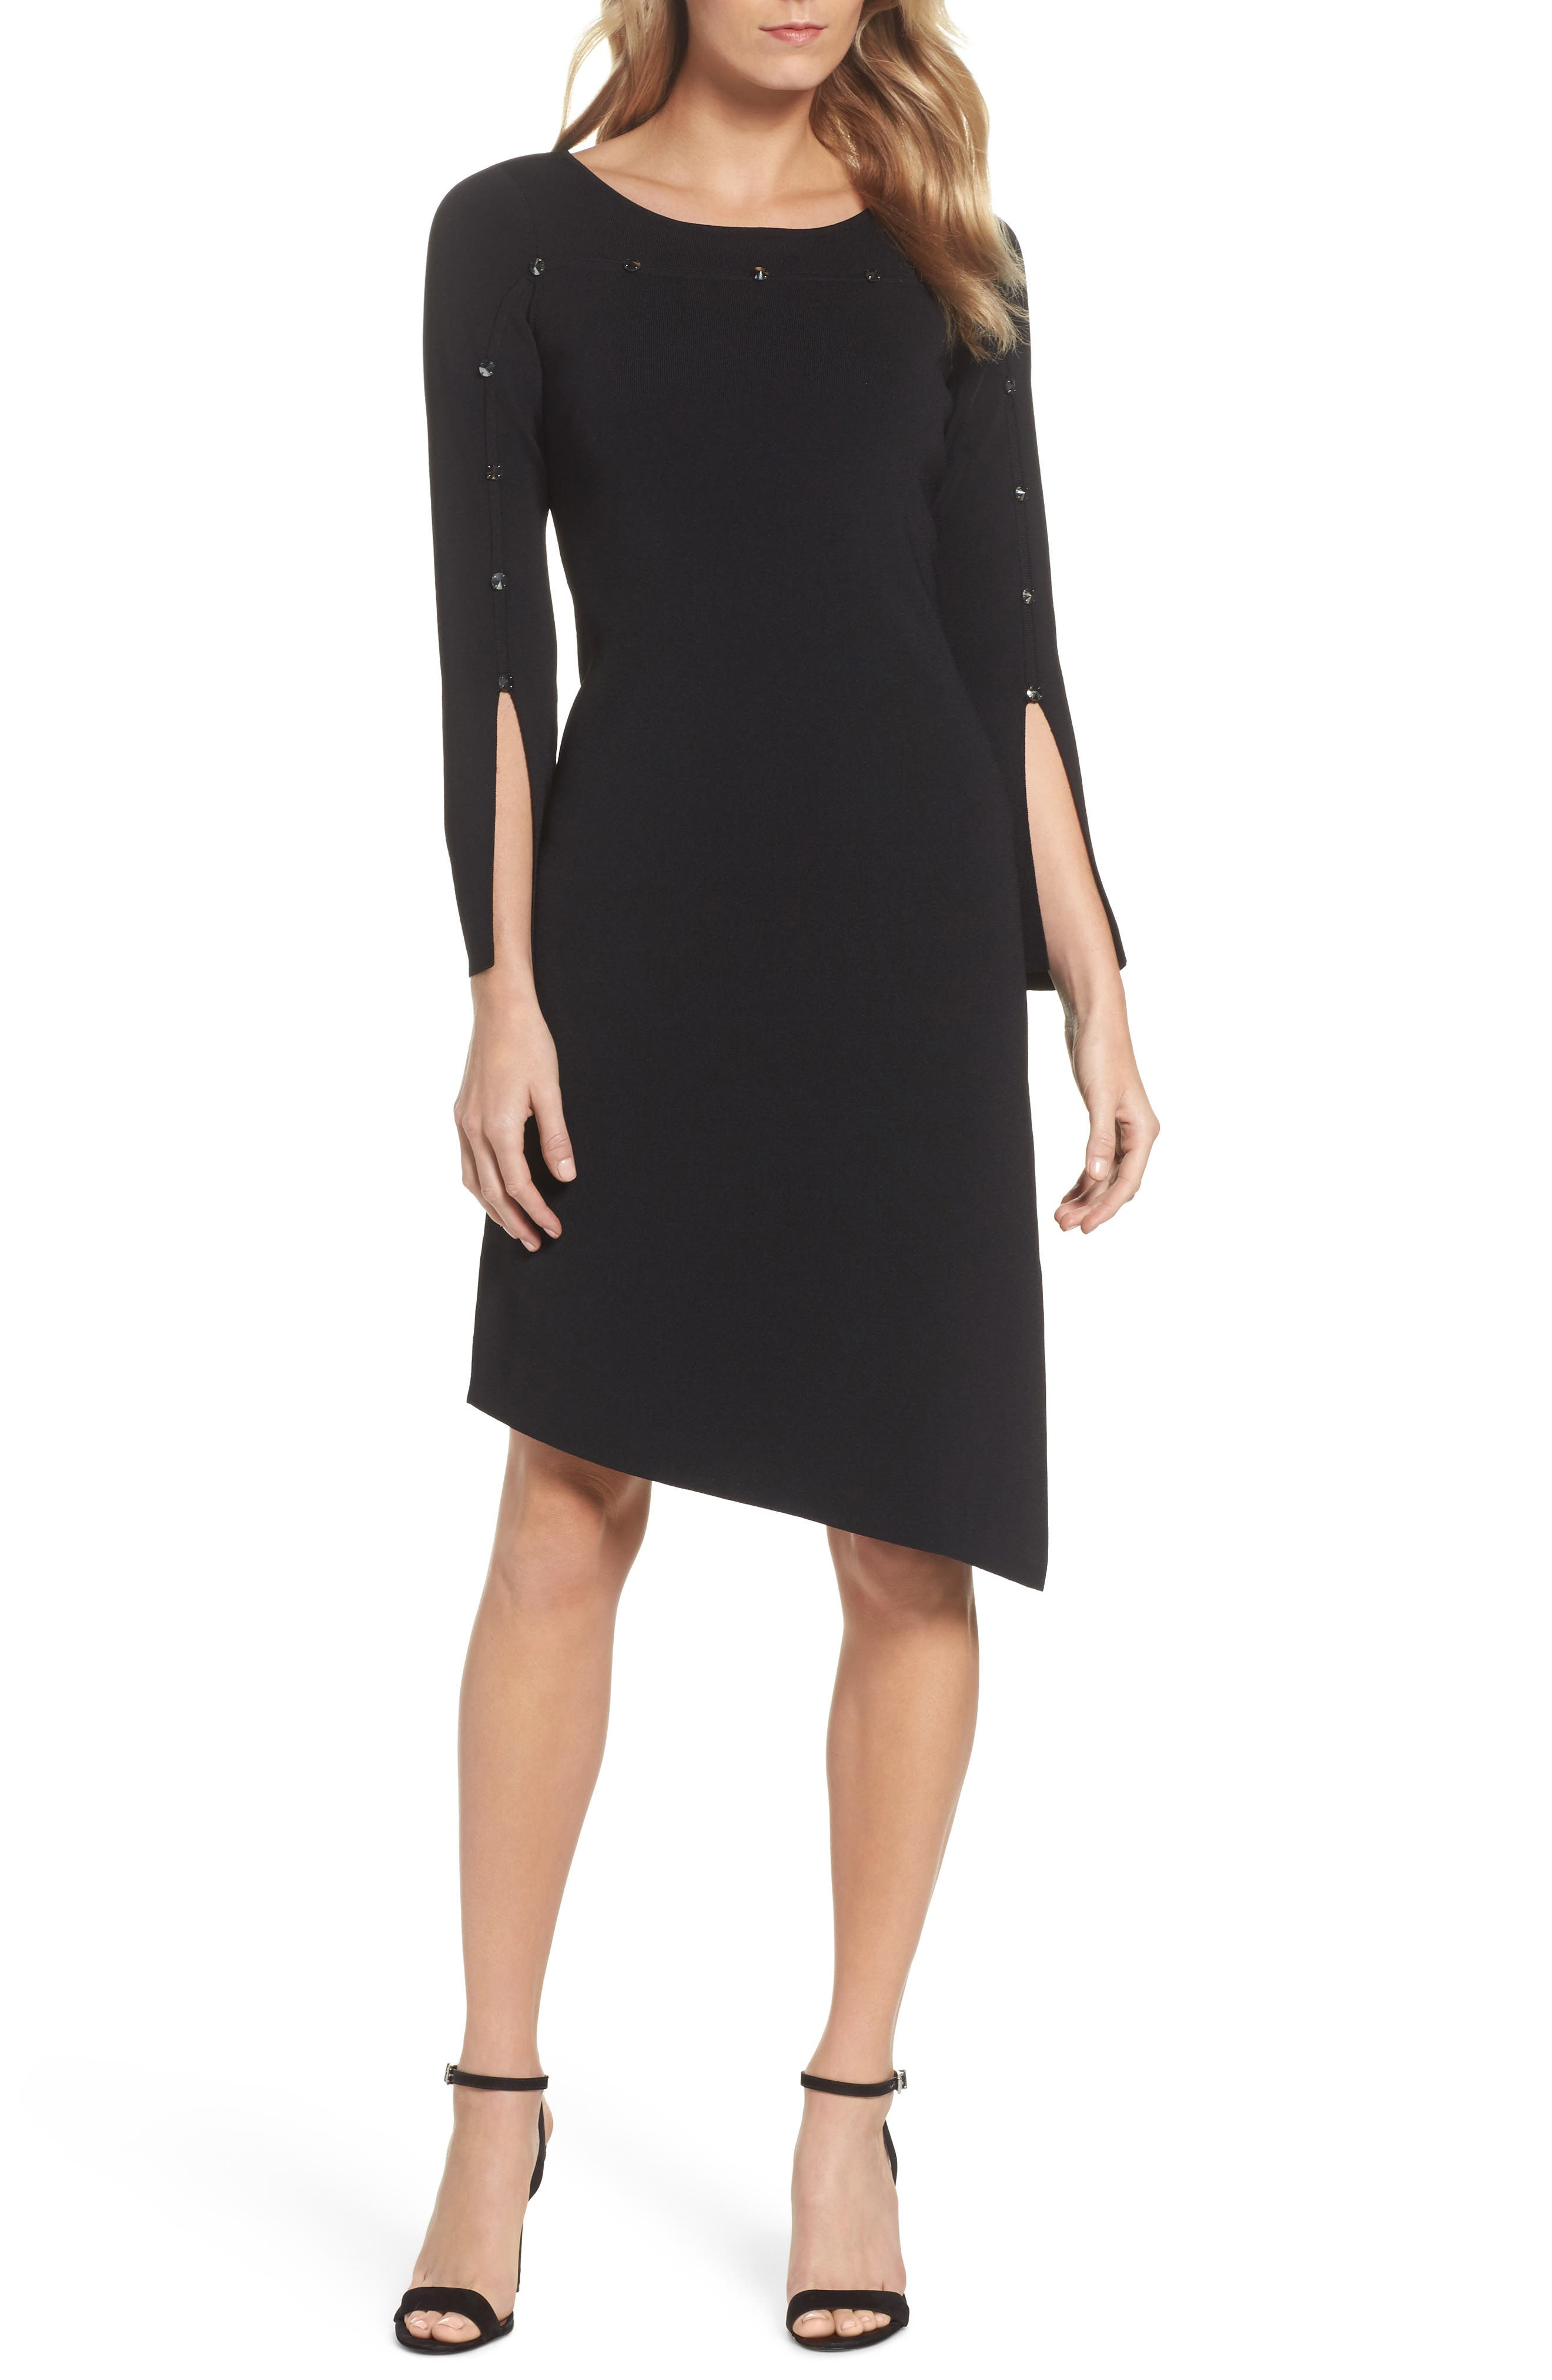 Main Image - NIC+ZOE Studded Asymmetrical Dress